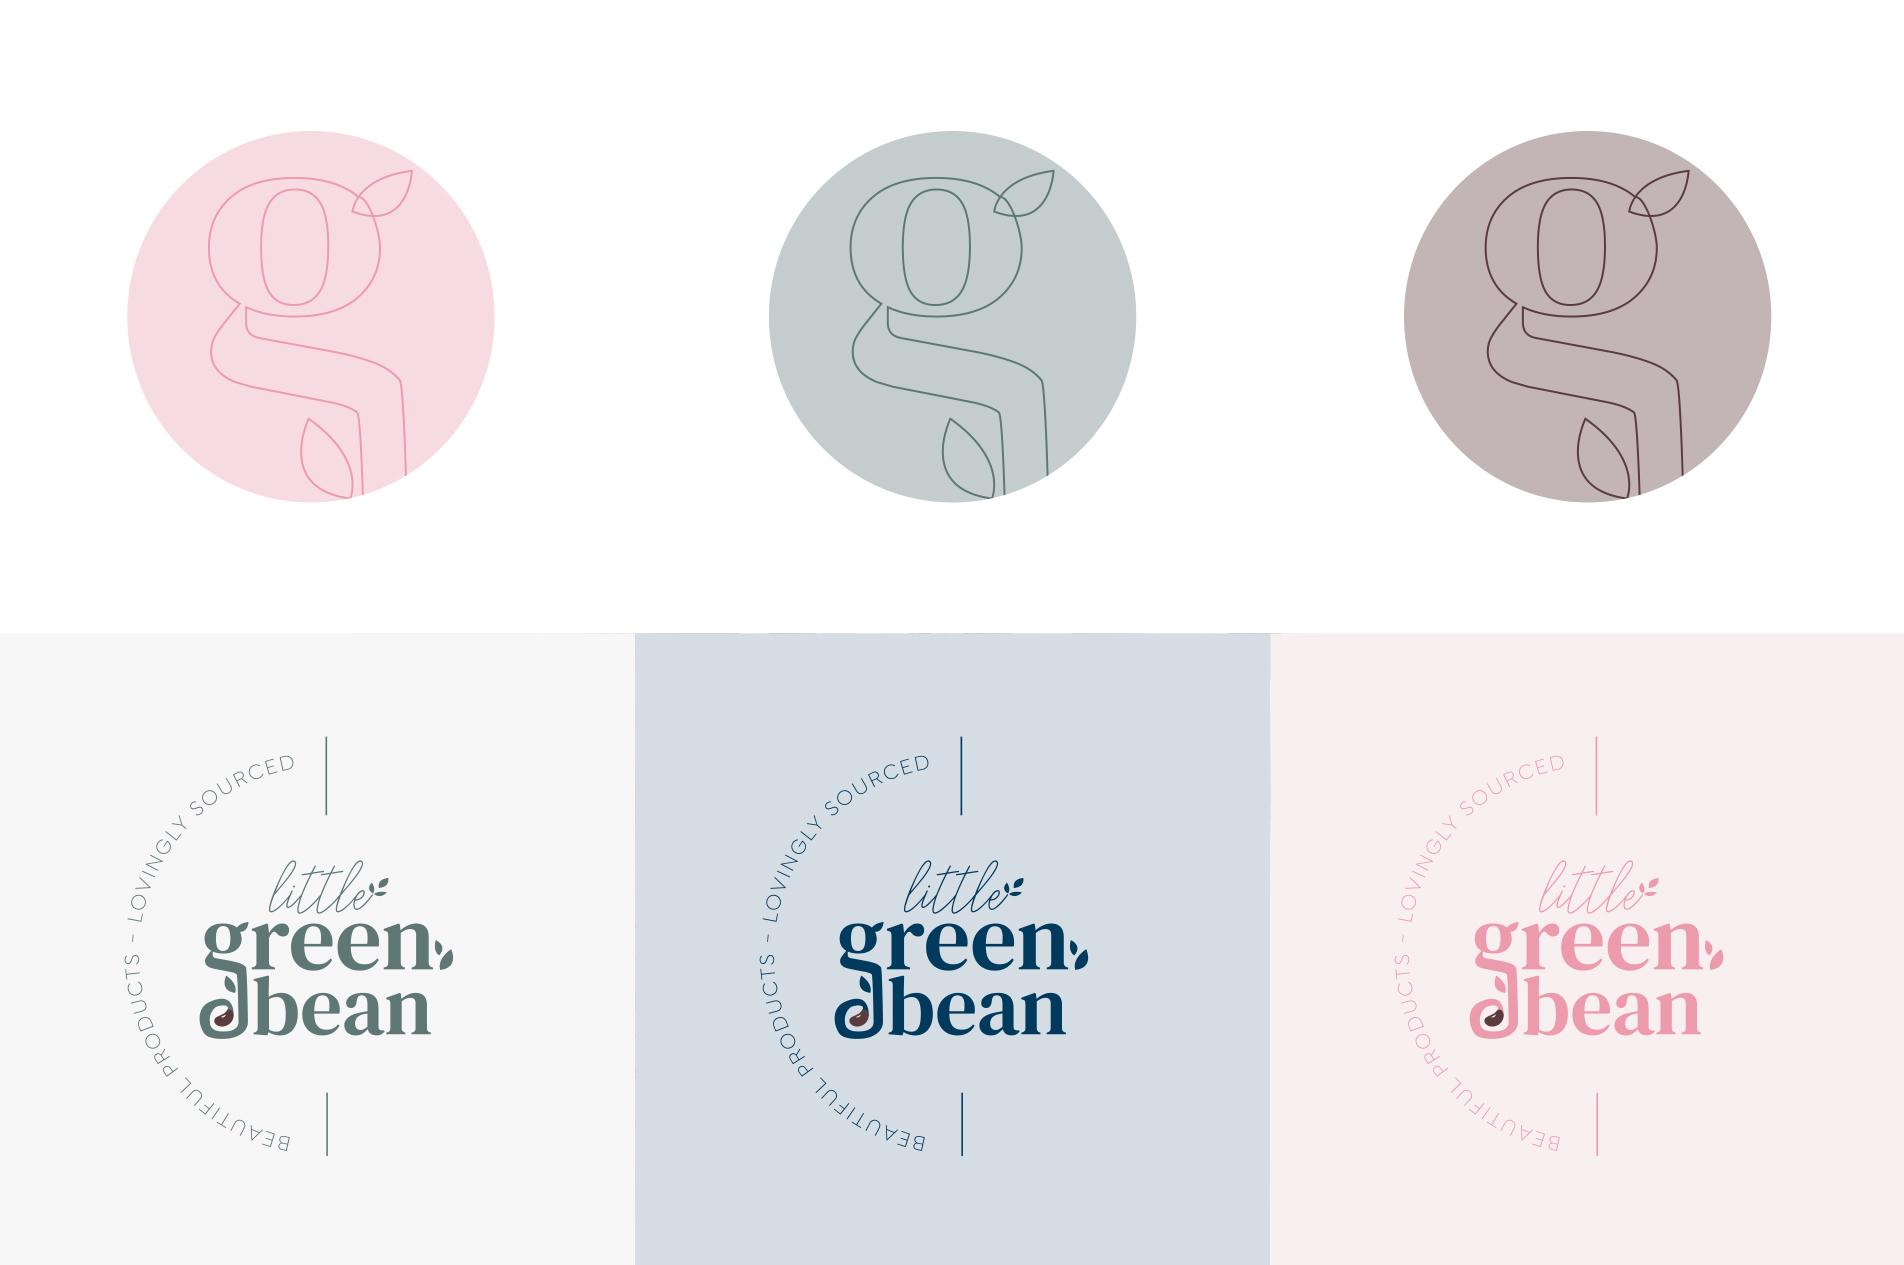 Aesthetic branding options